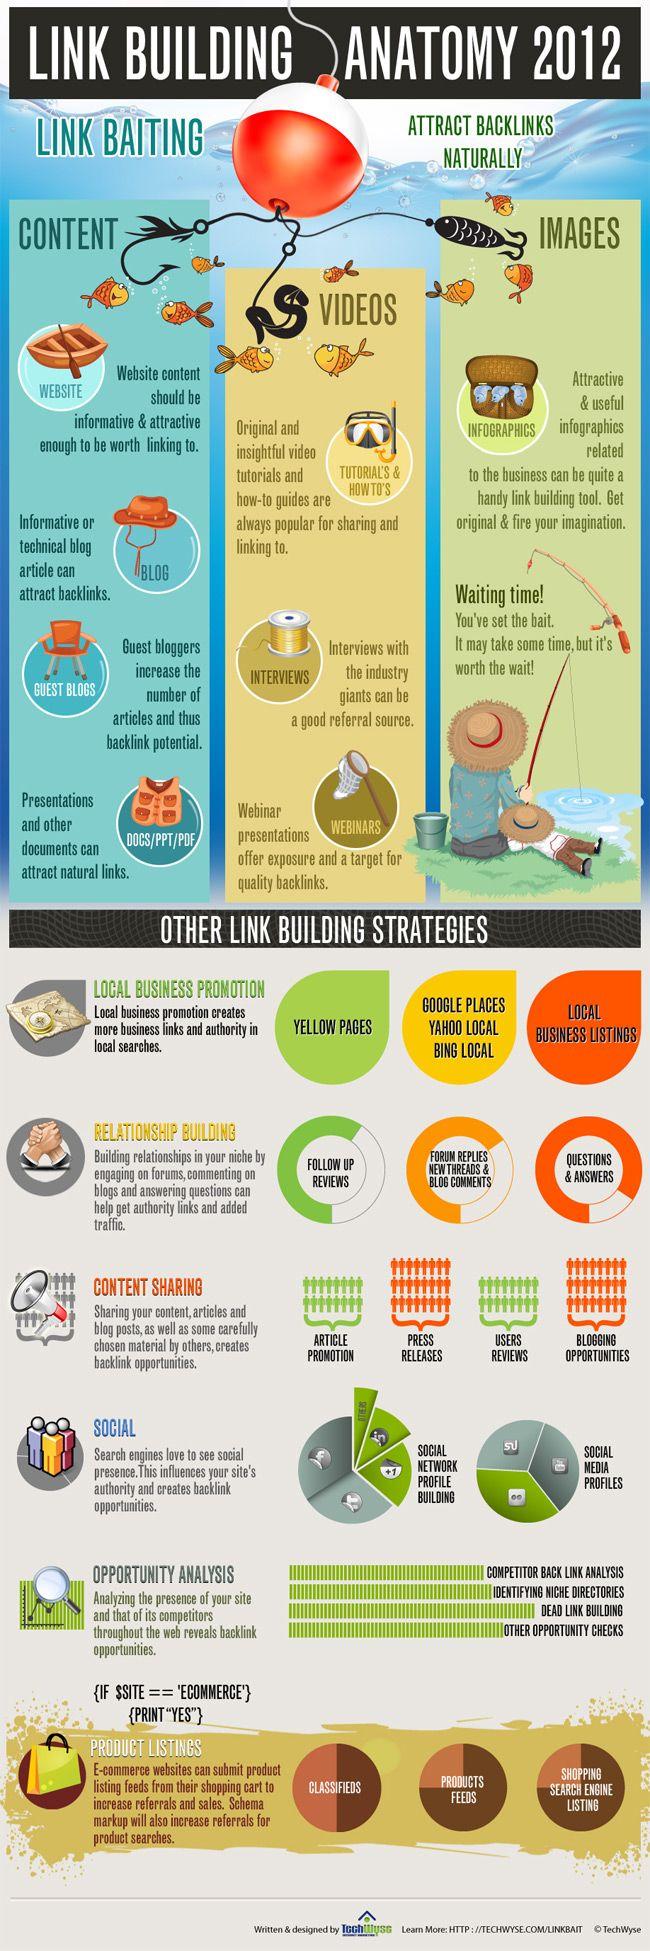 Link Building Anatomy 2012 Infographic